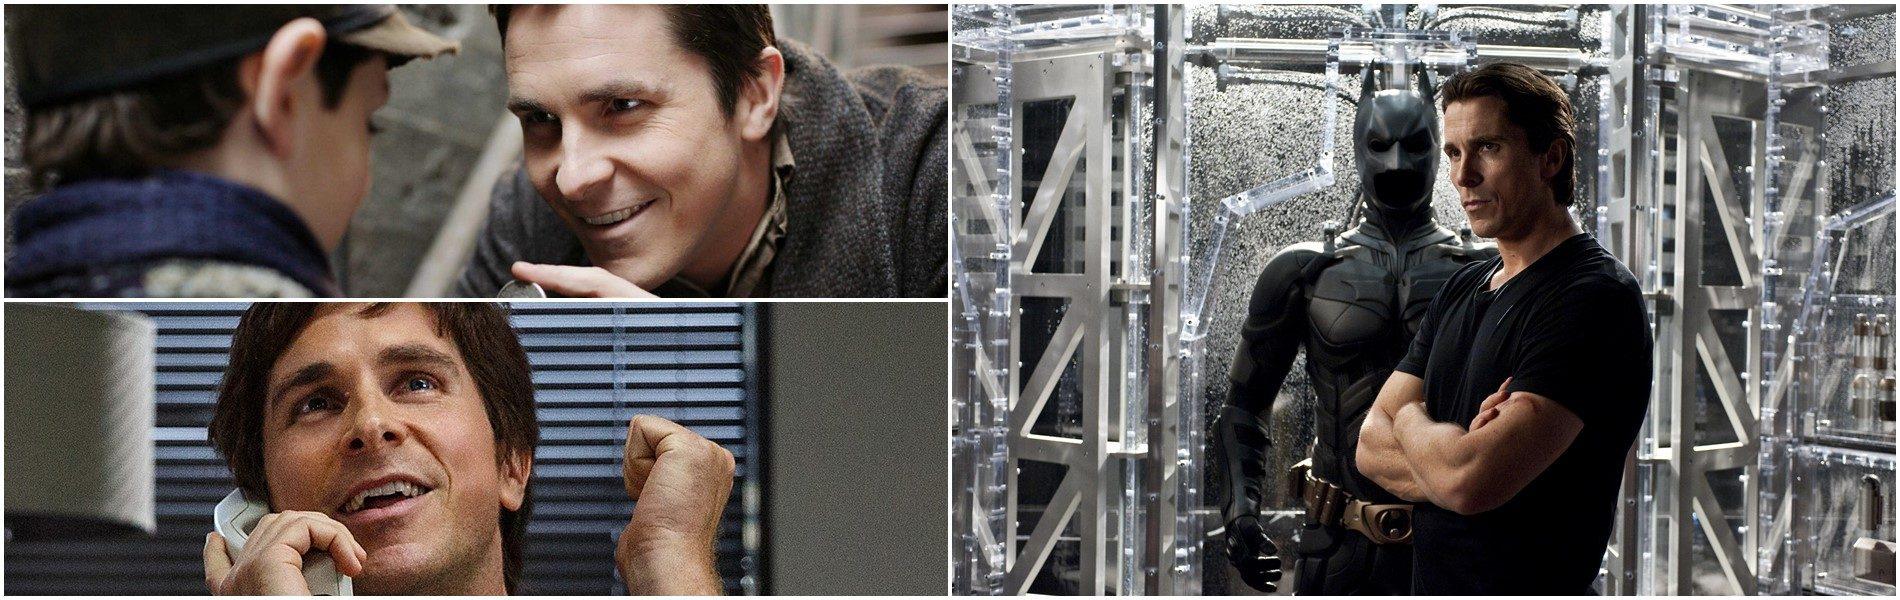 Christian Bale 8 legjobb filmje